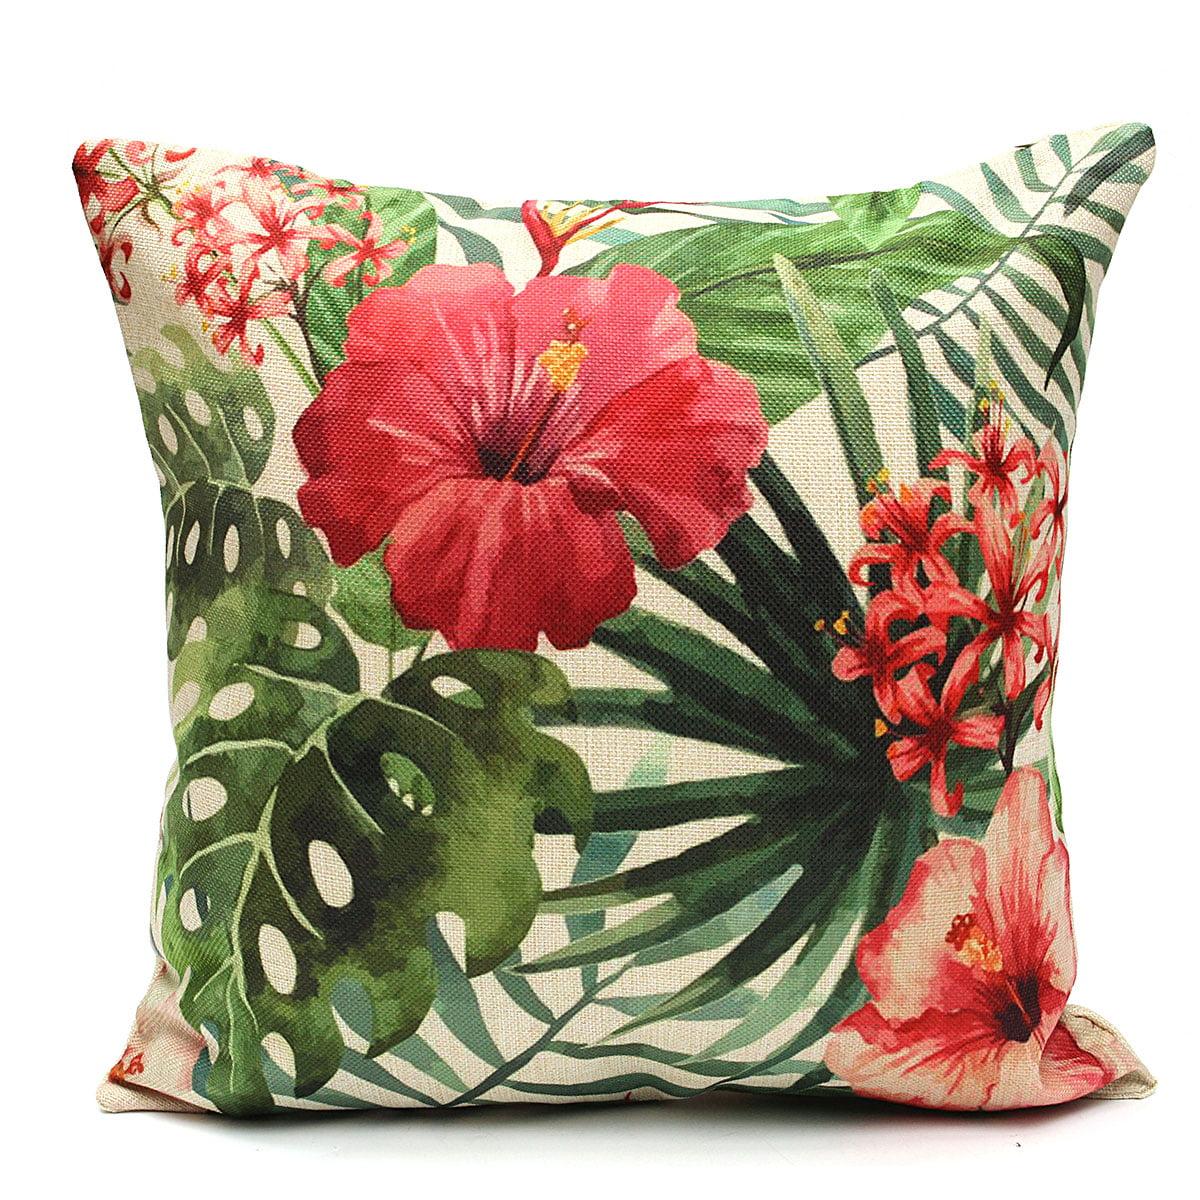 Tropical Plant Flamingo Cotton Linen Throw Pillow Case Cushion Cover Home Decor,... by